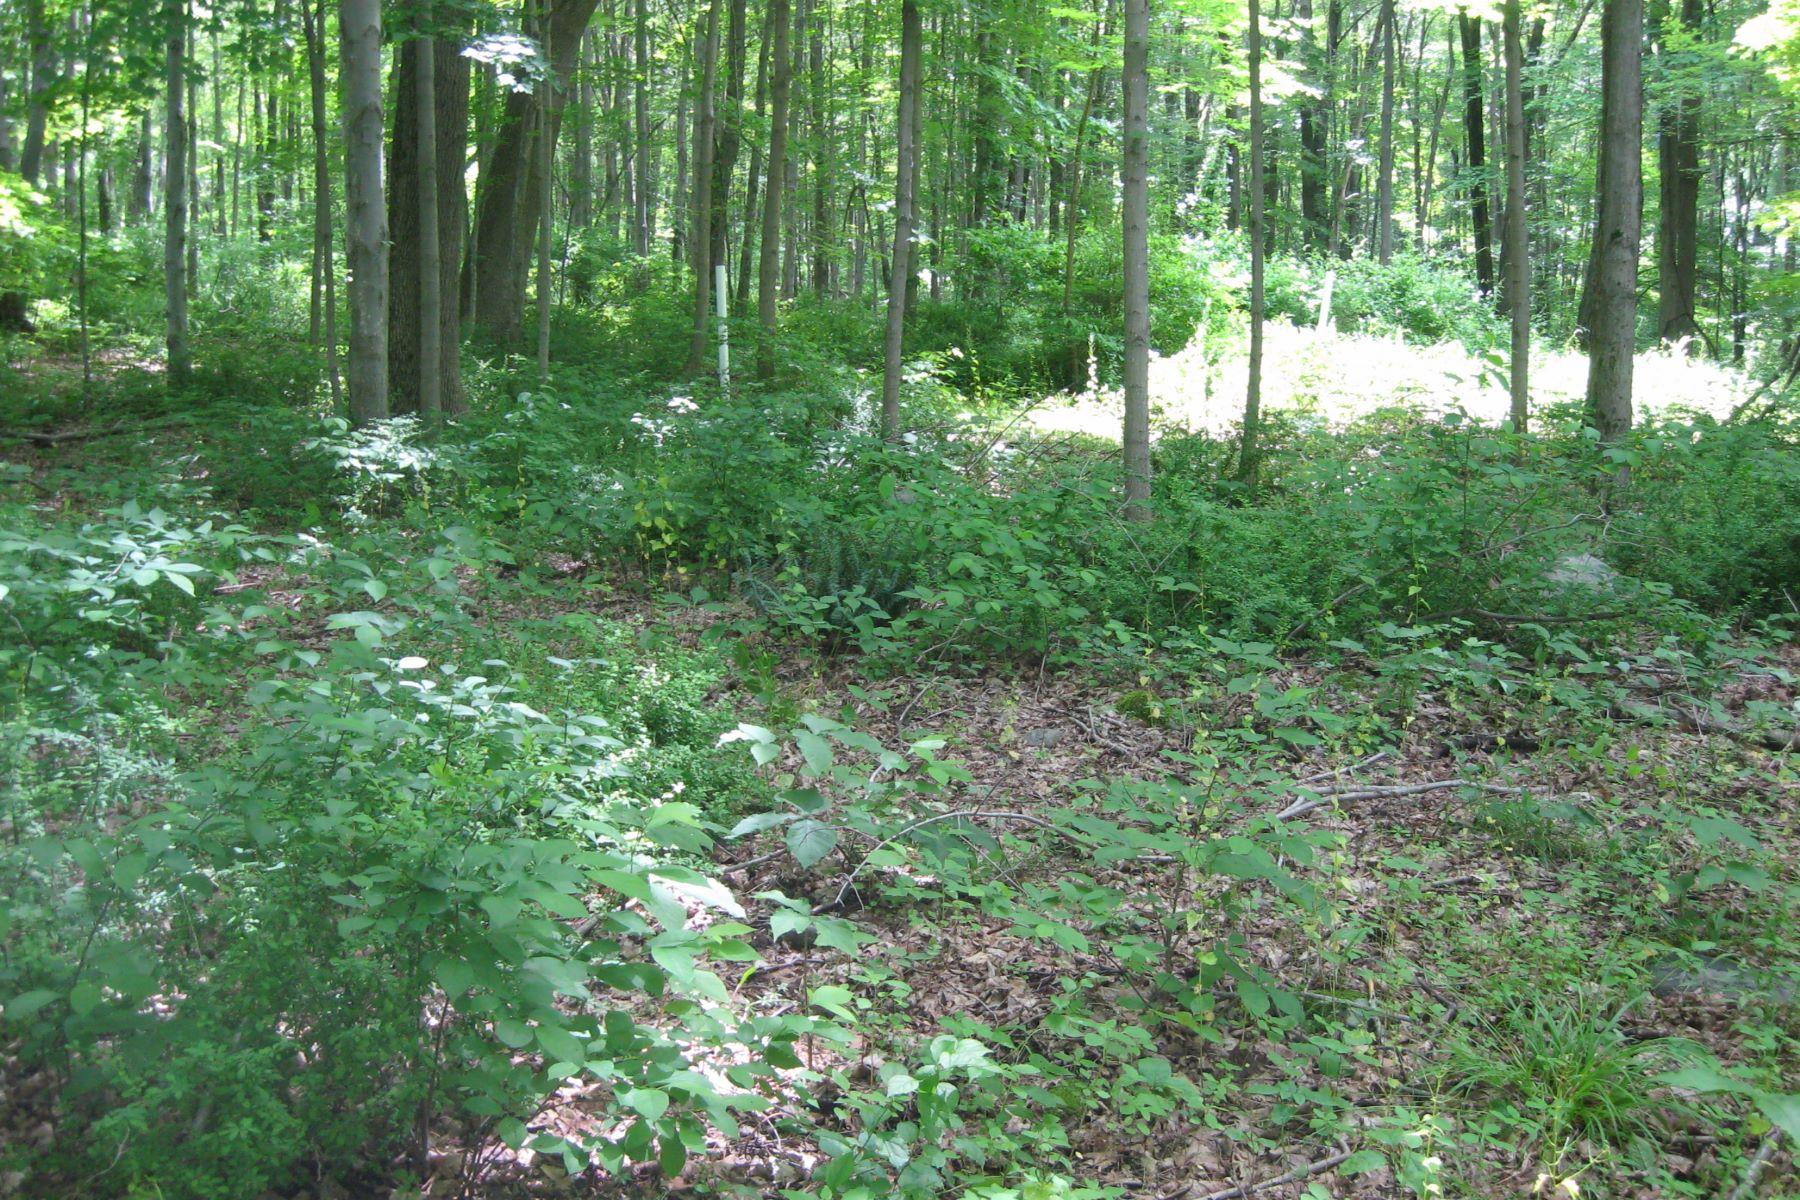 Đất đai vì Bán tại Candlewood Terrace Lake Community Juniper Drive, New Milford, Connecticut, 06776 Hoa Kỳ